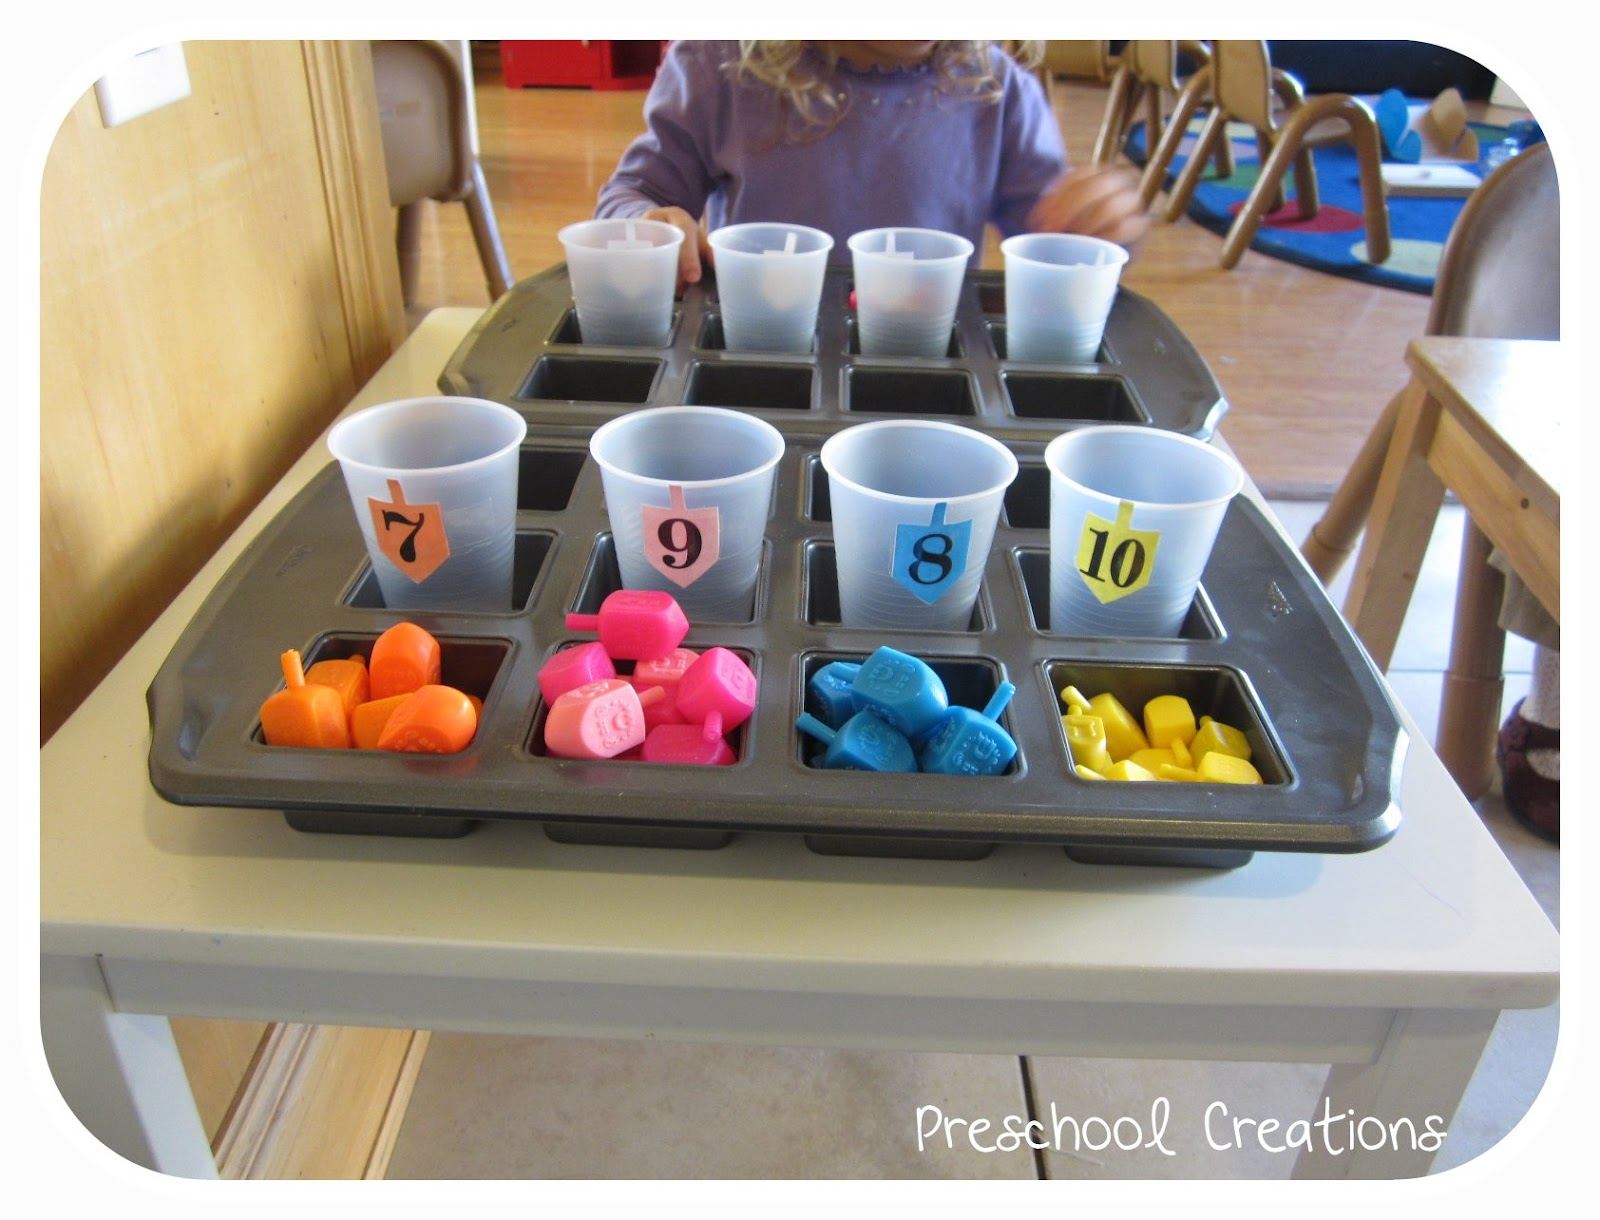 Preschool Creations Dreidel Counting